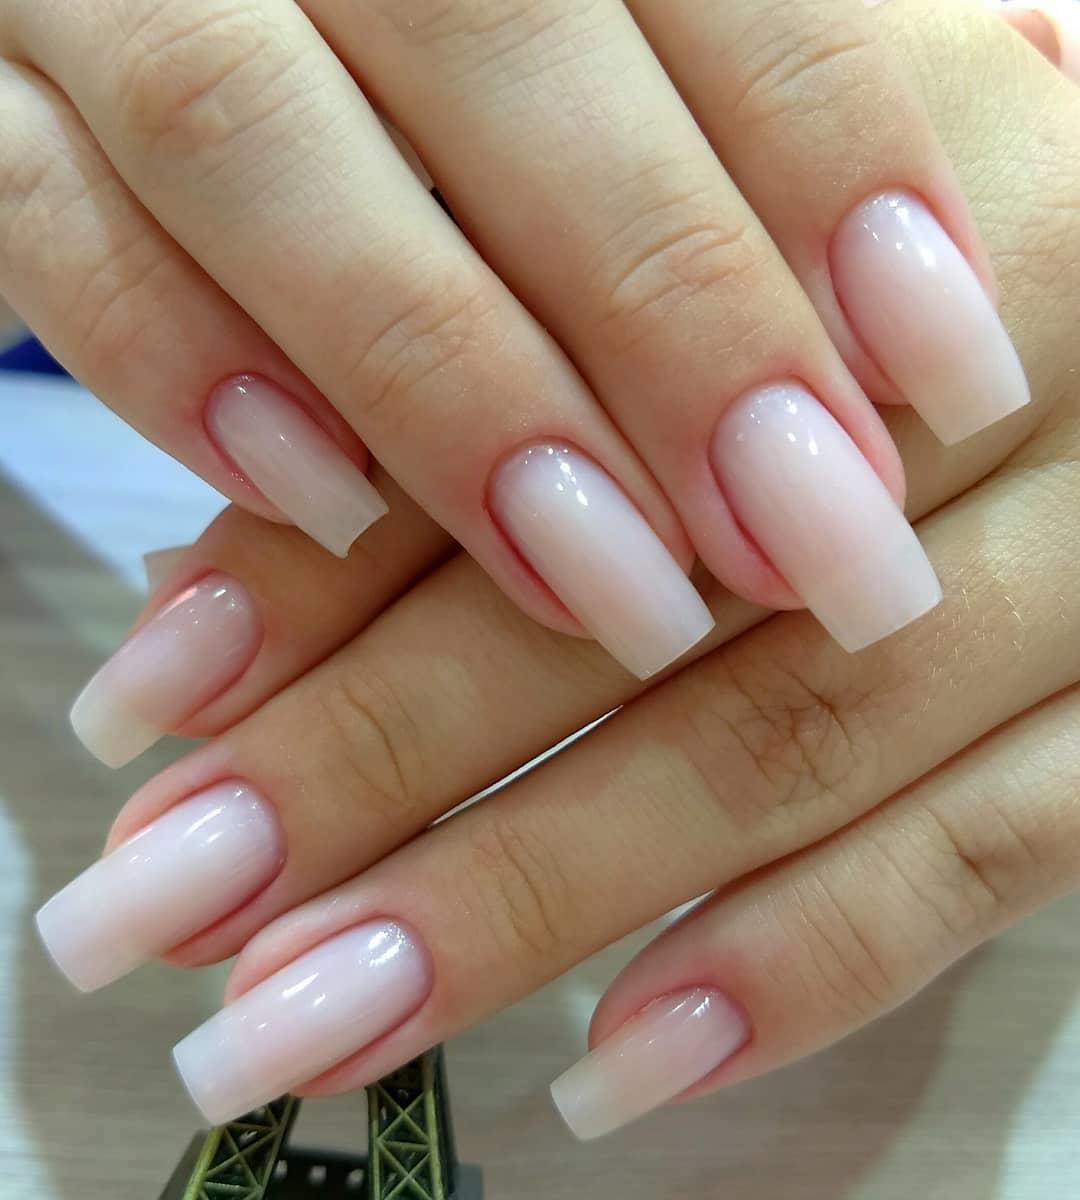 popular unique nail designs 2019 3 - Popular Unique Nail Designs 2019